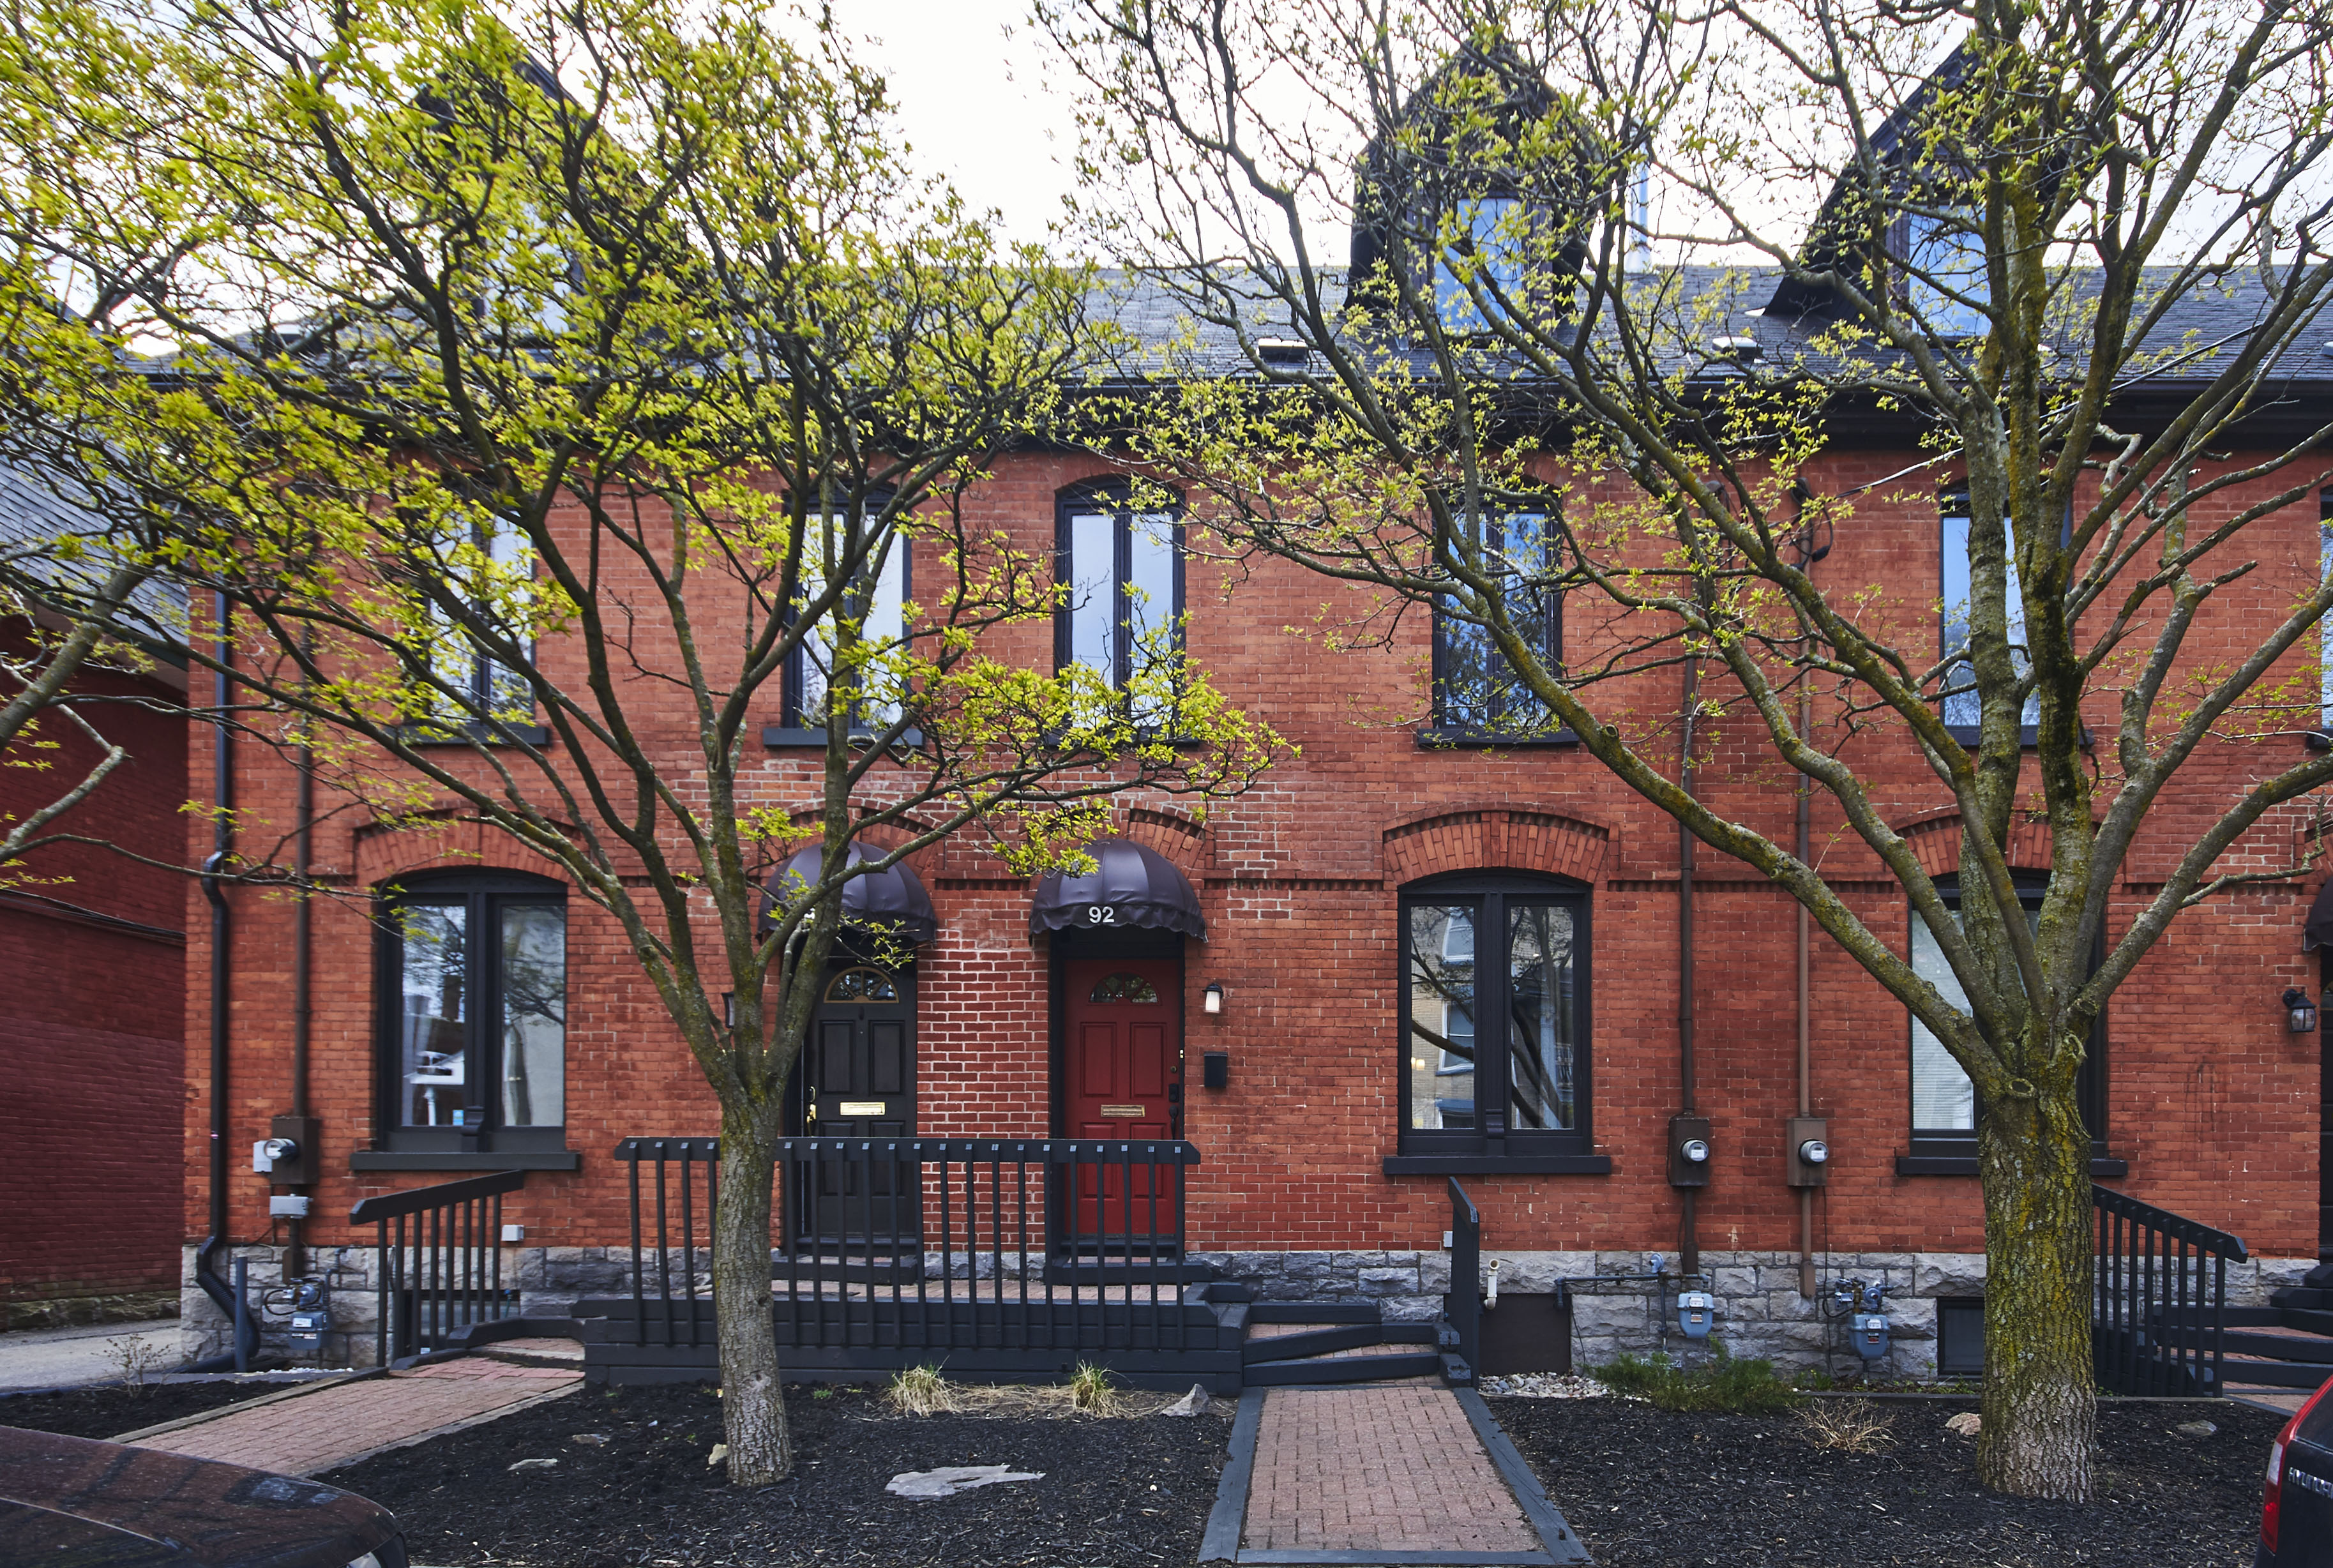 92 Stewart Street – Sold May 2020